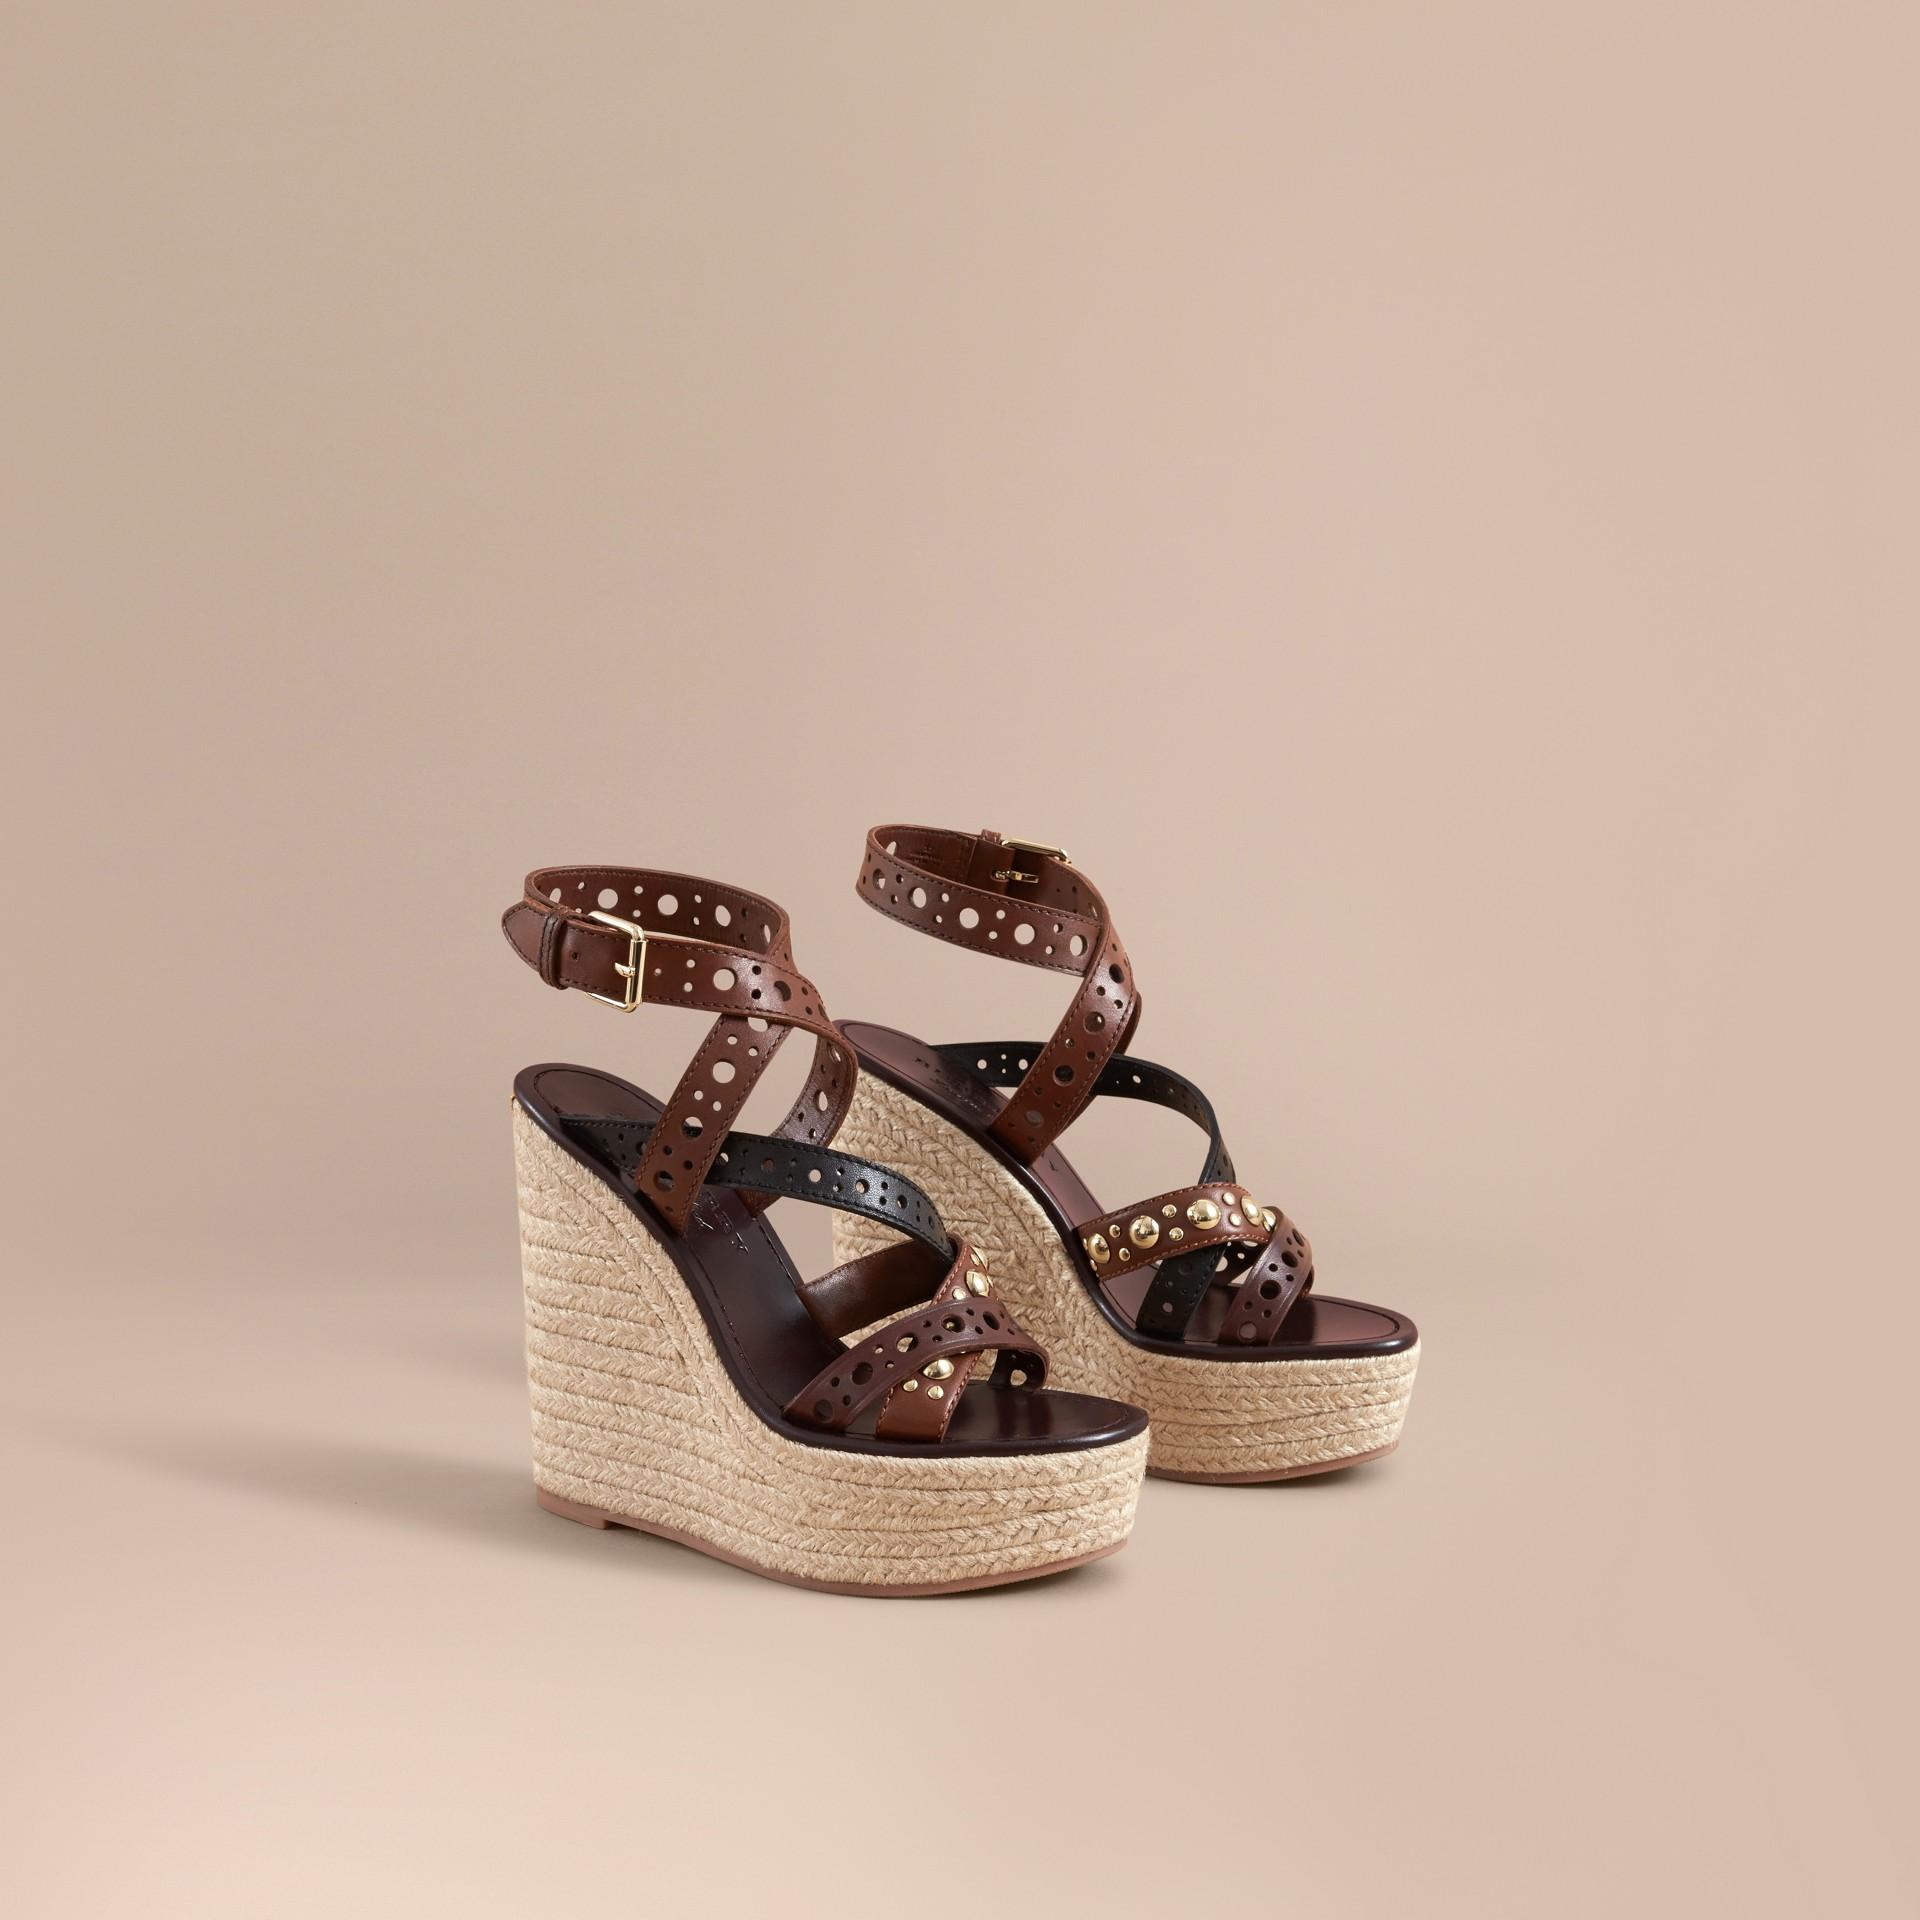 Riveted Leather Platform Espadrille Wedge Sandals - gallery image 1